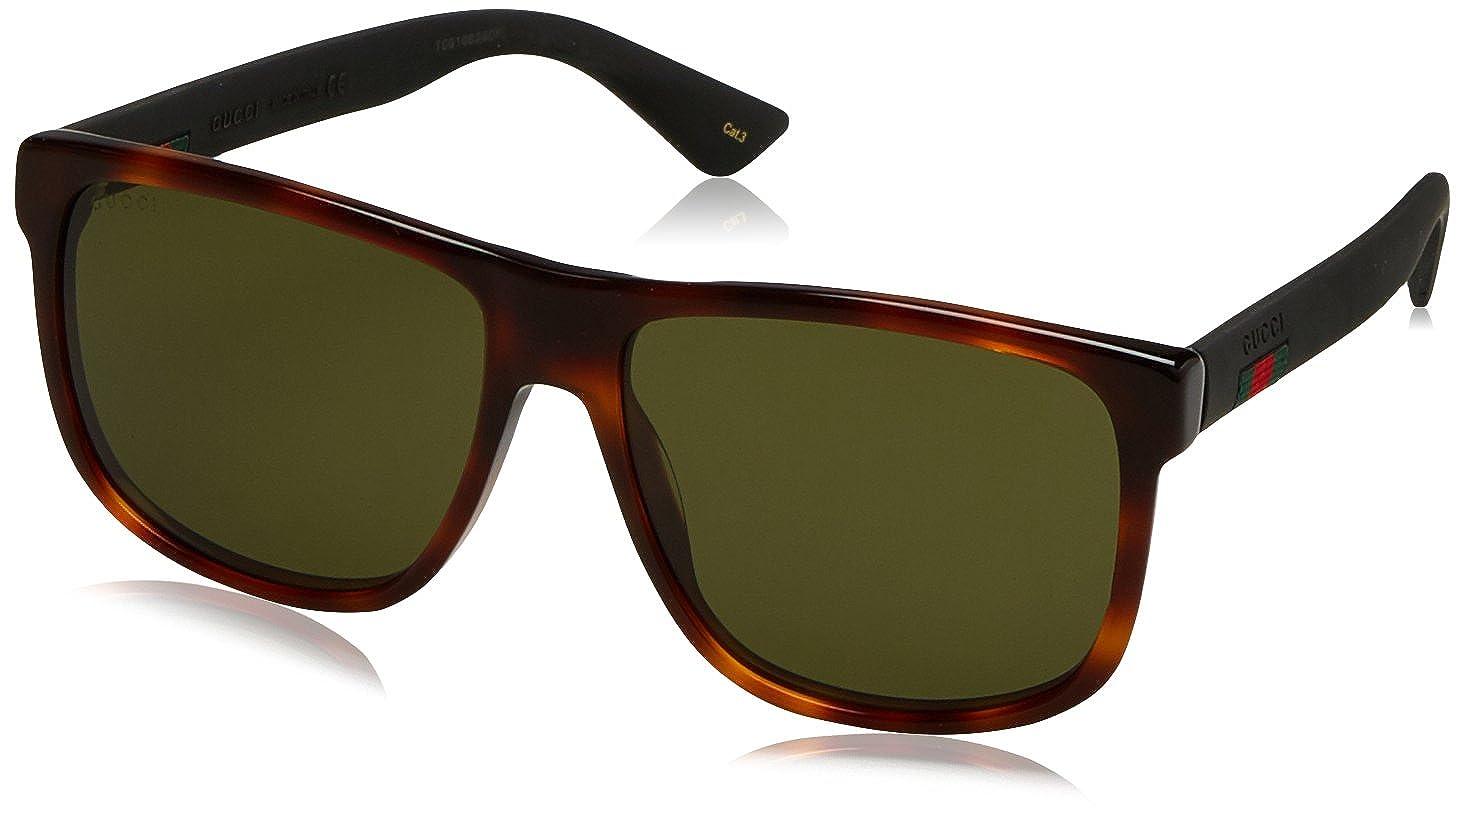 2ff52bcdaa0 Amazon.com  Gucci GG0010S-006-58 Brown Aviator Sunglasses  Gucci  Clothing